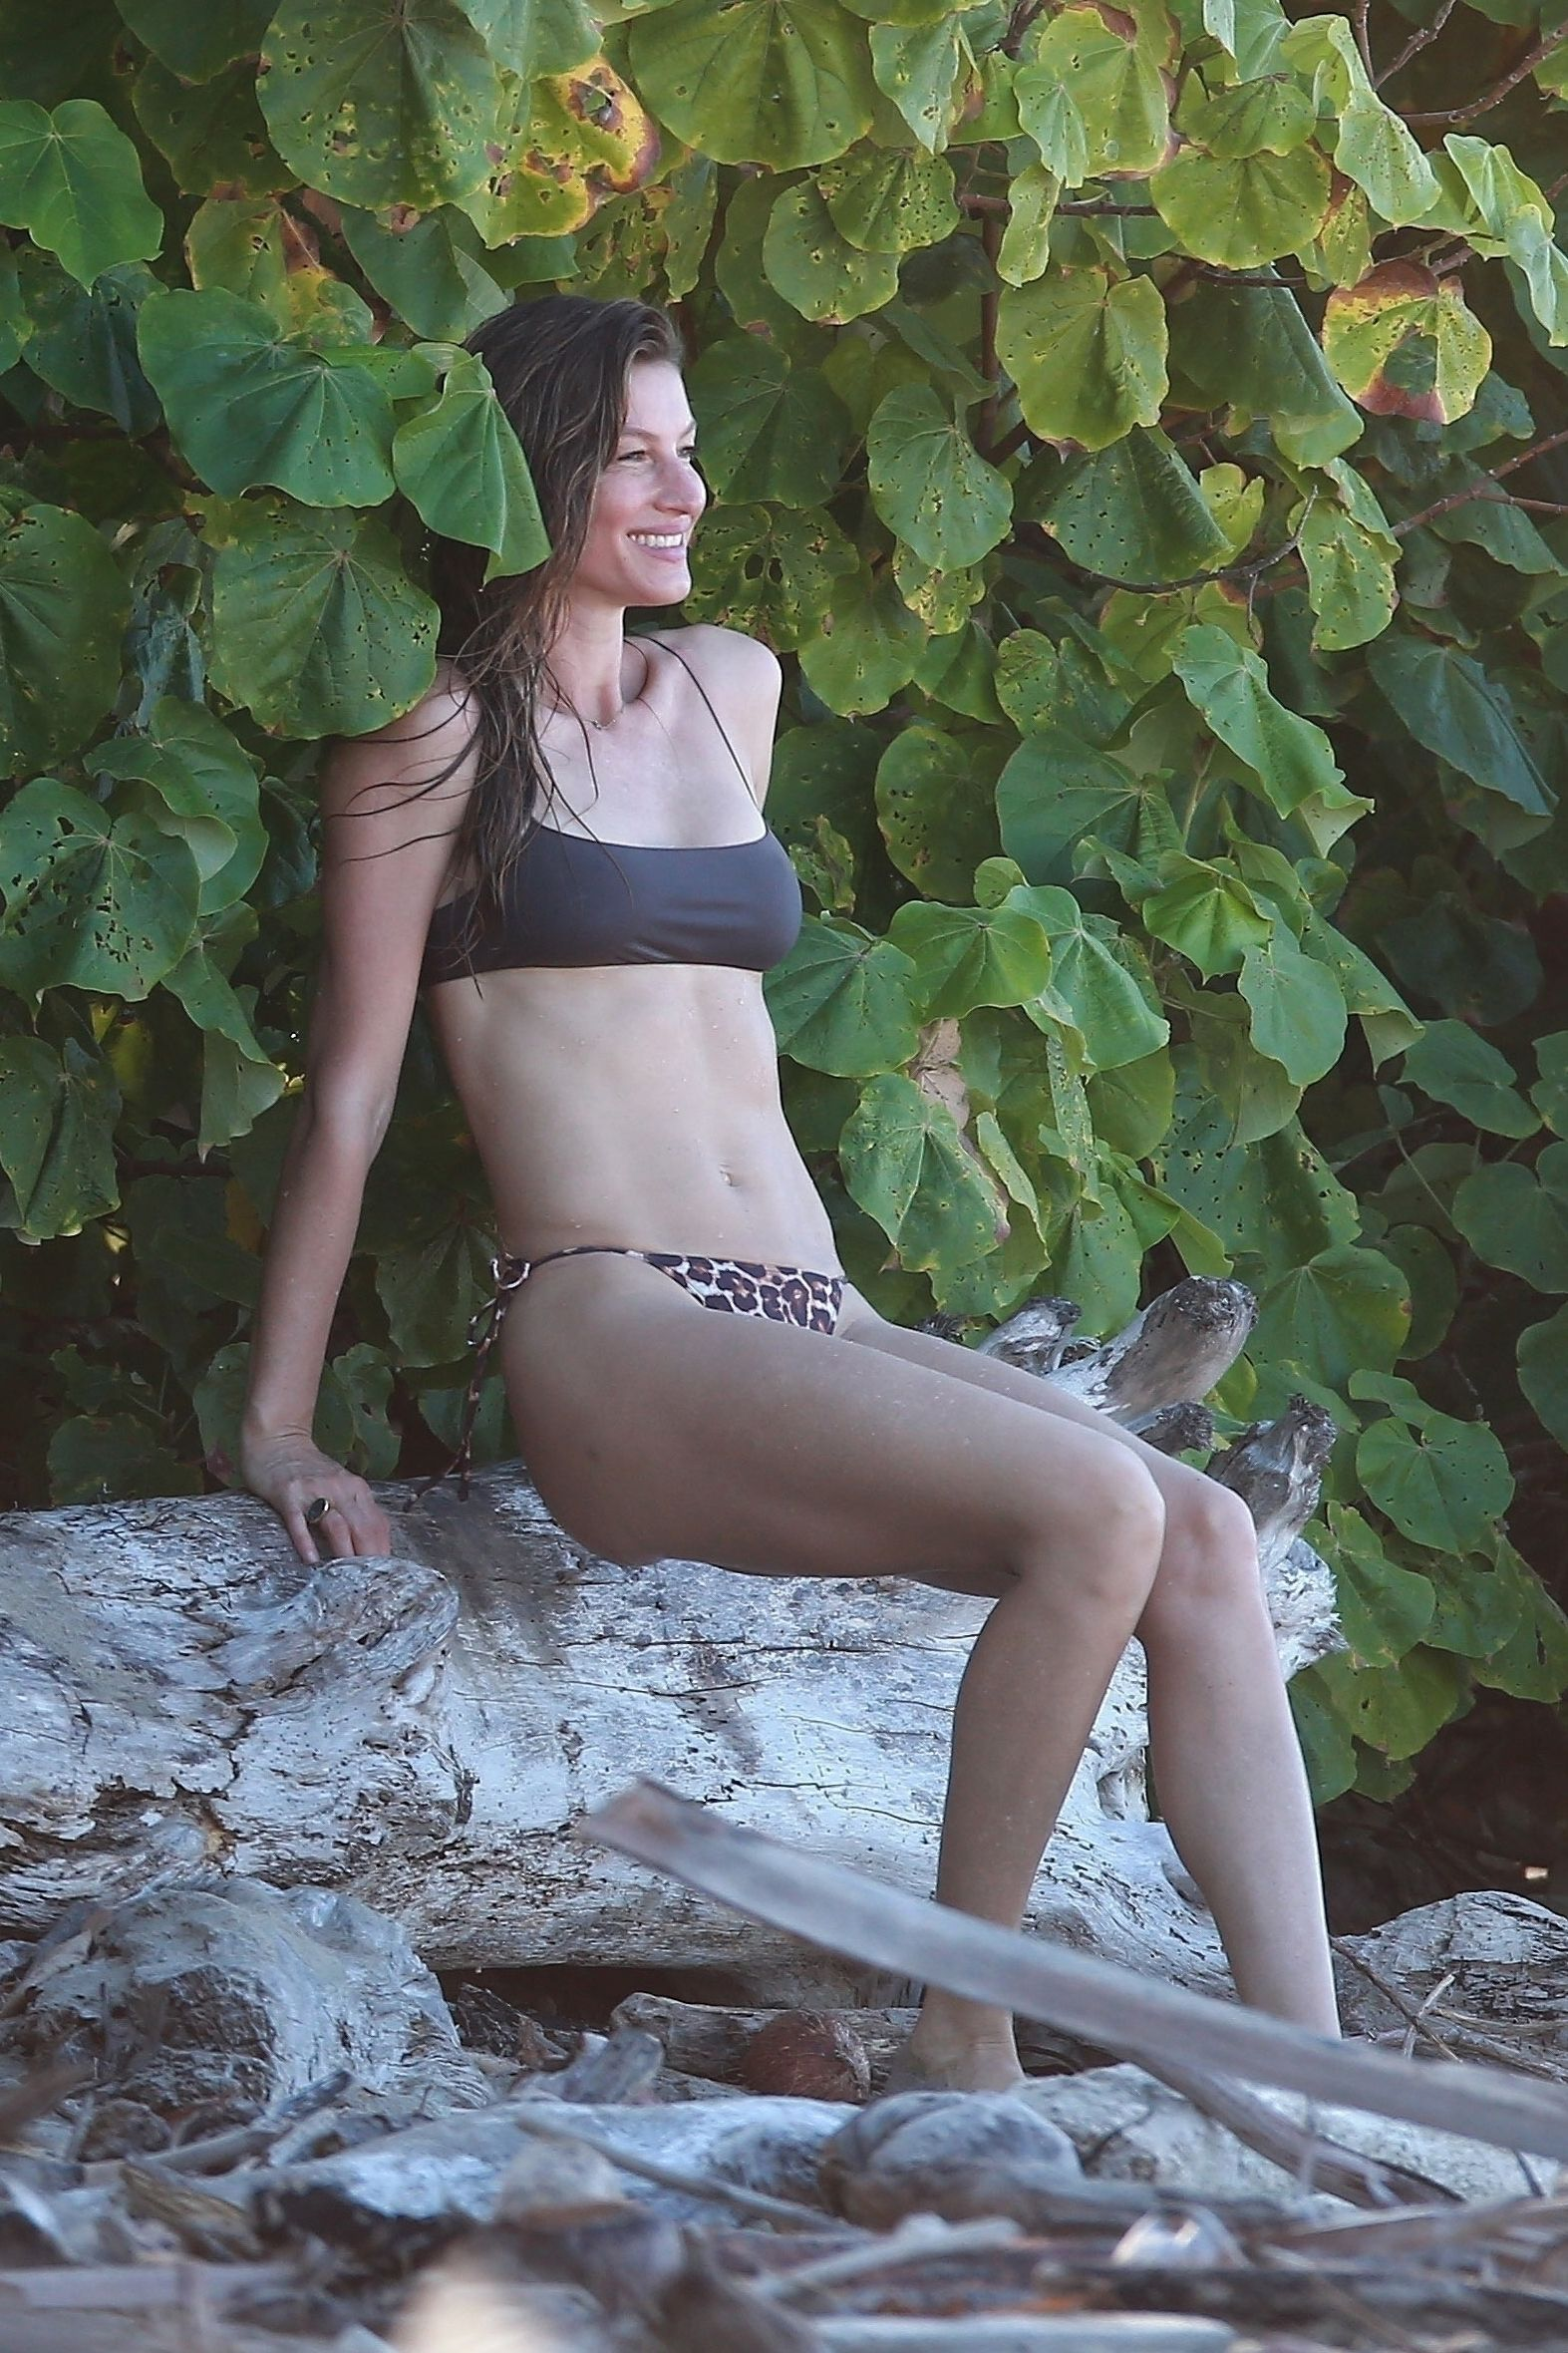 Gisele Bundchen Puts Her Incredible Bikini Body On Display During A Beach Photoshoot 0033